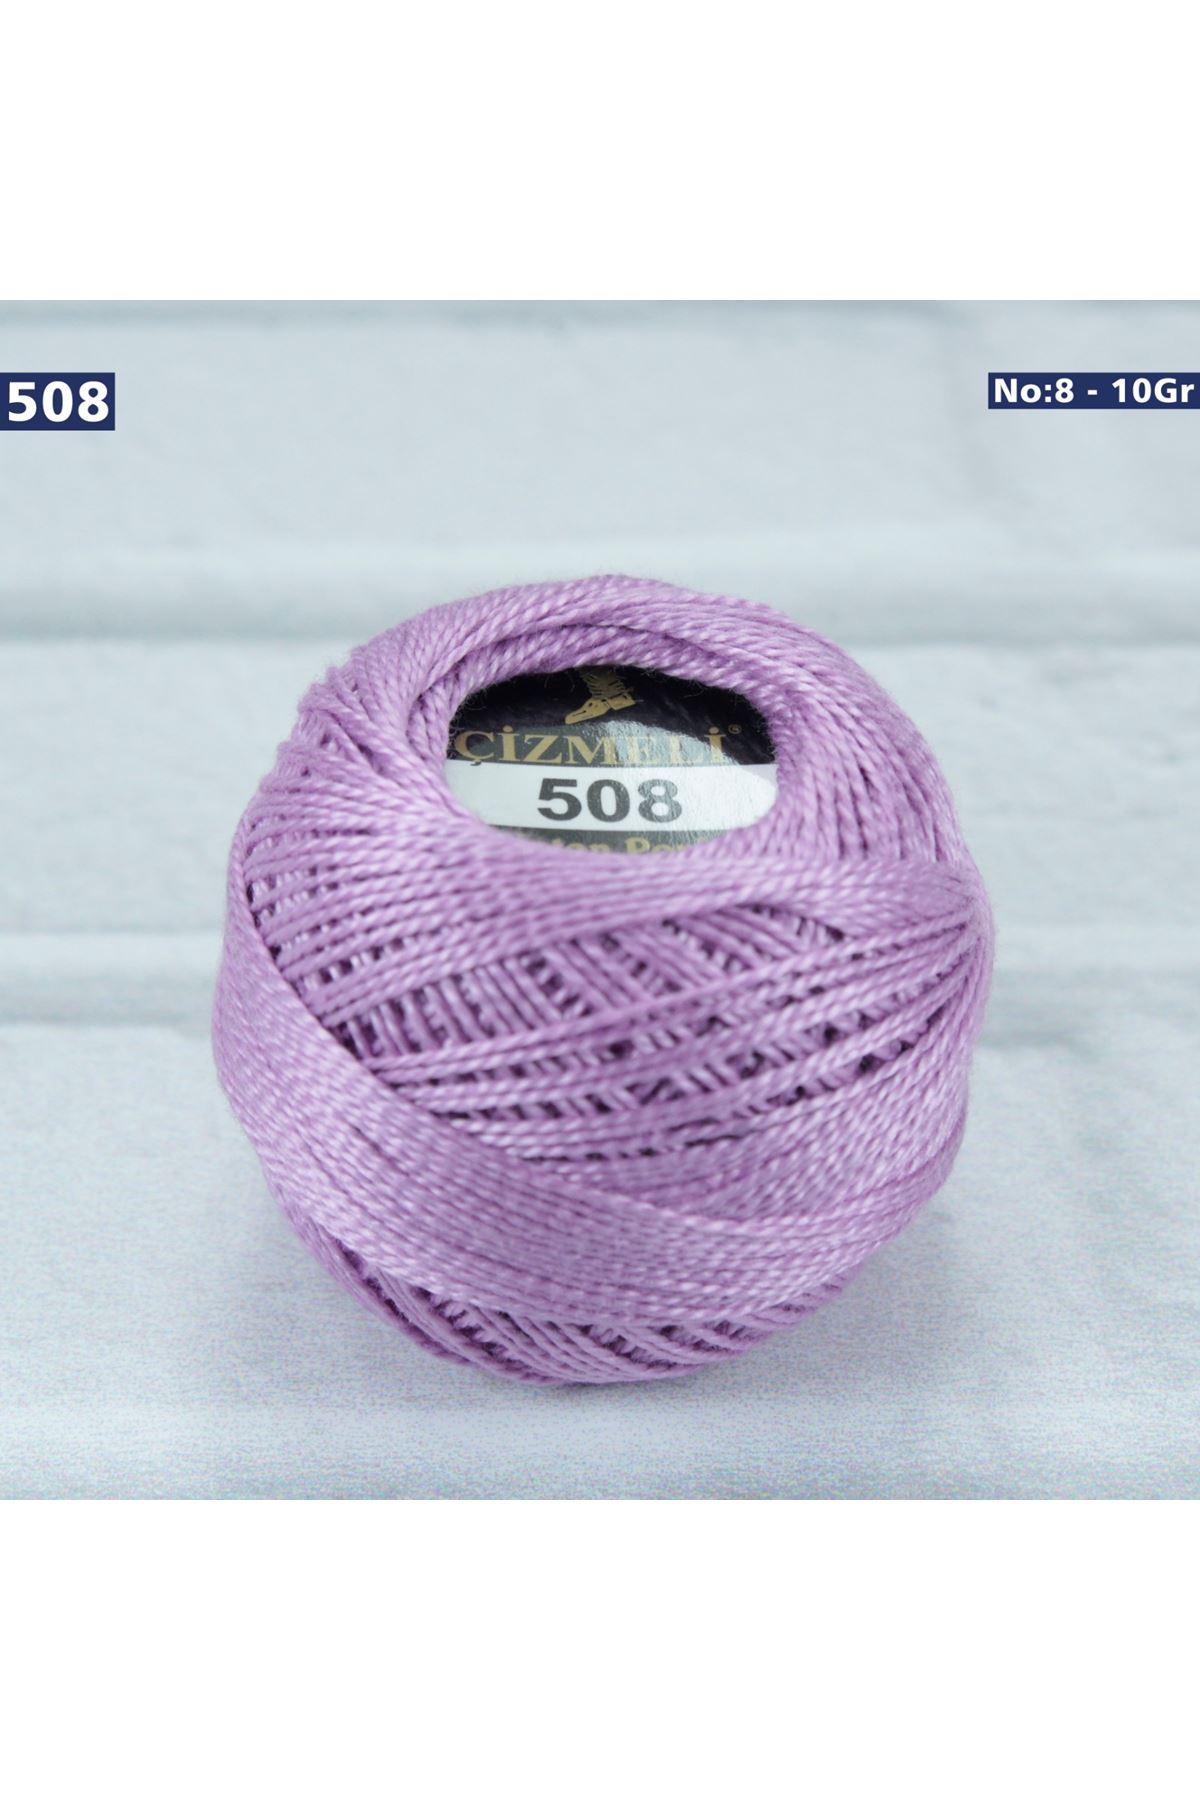 Çizmeli Cotton Perle Nakış İpliği No: 508